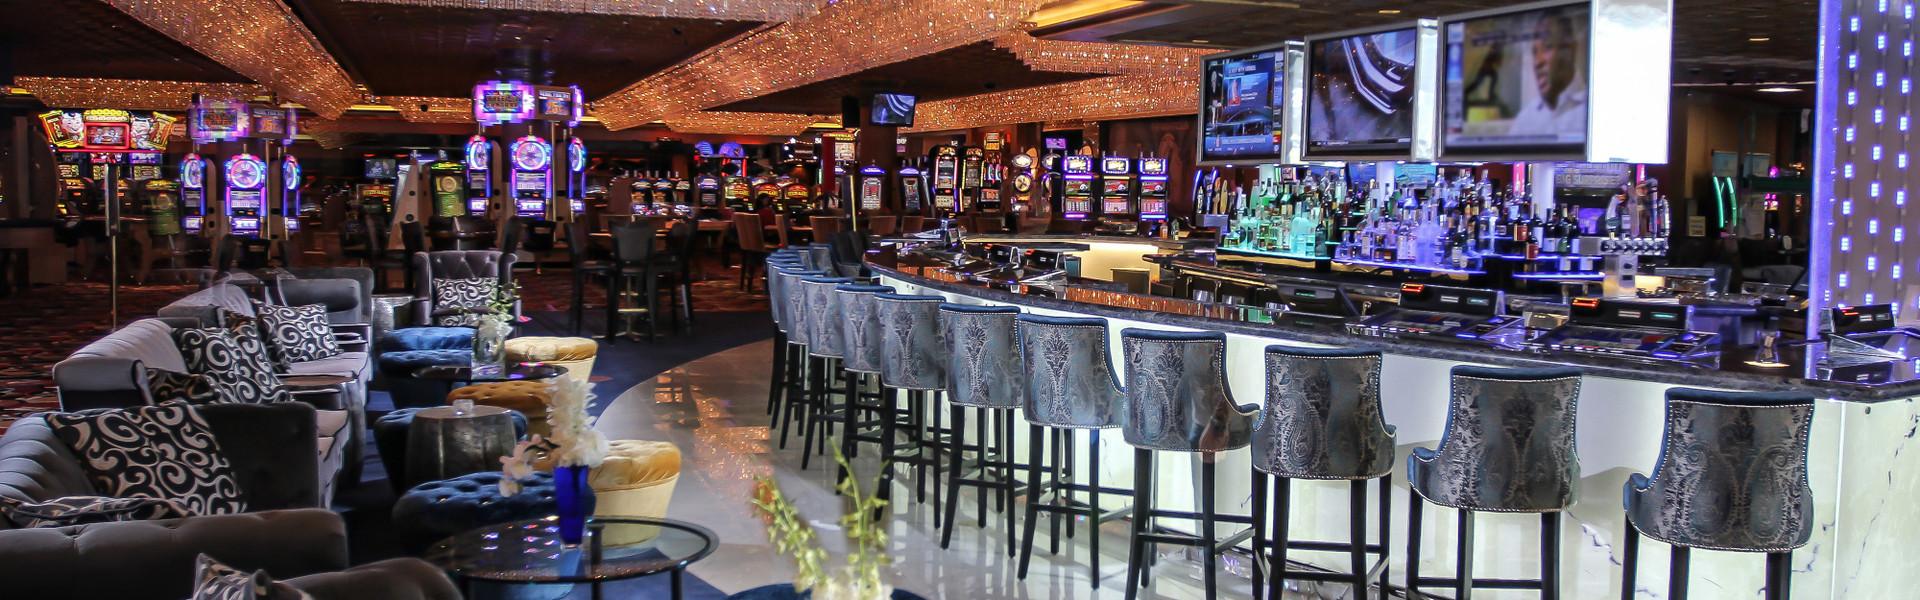 The International Bar   Westgate Las Vegas Resort & Casino